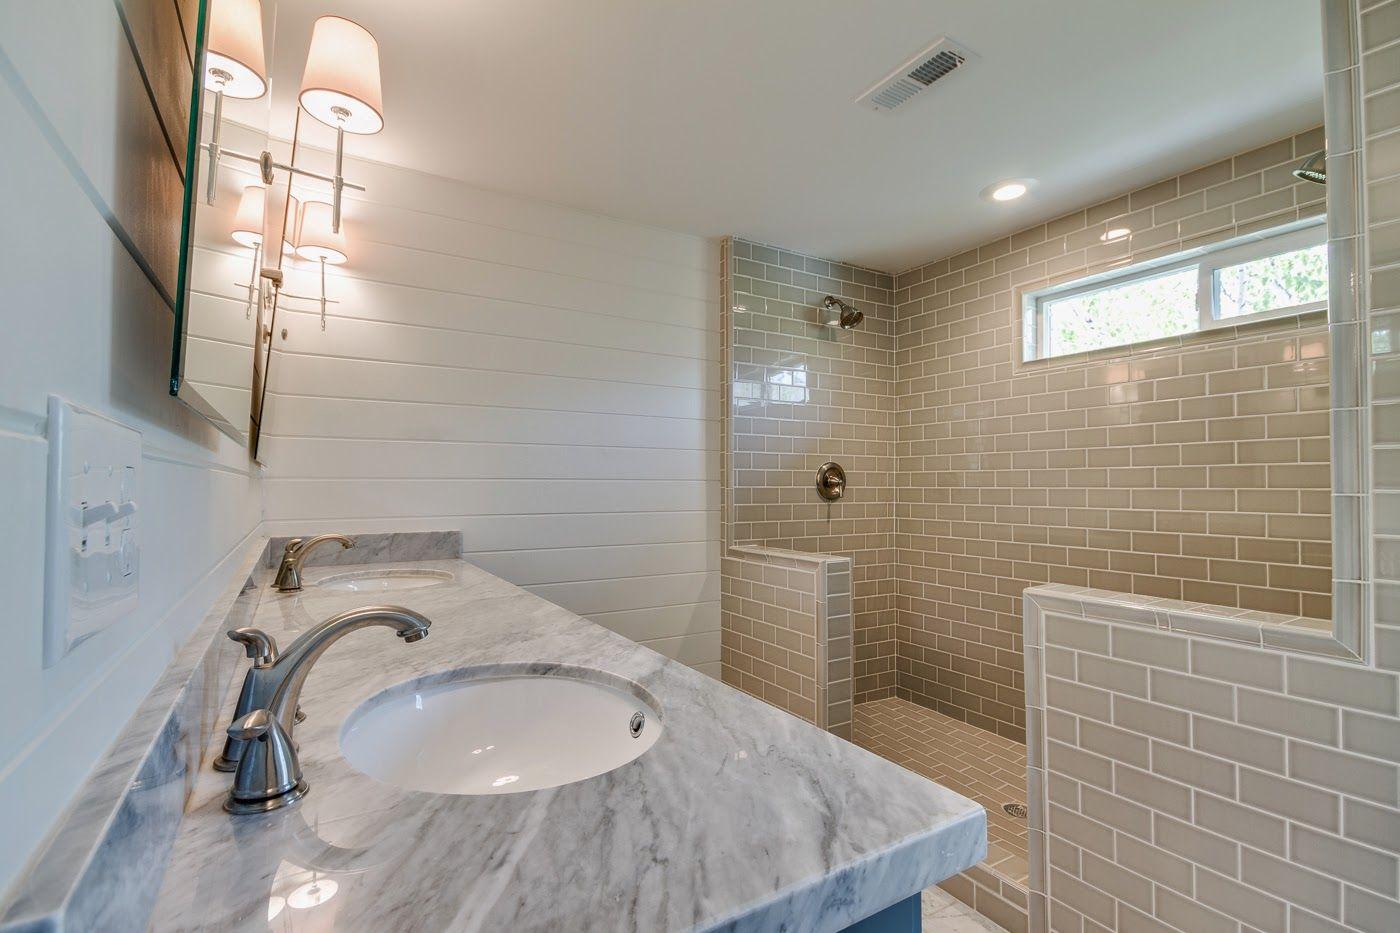 Shower Tile Arizona Tile Hl Pumice 3x6 Tile With Mapei